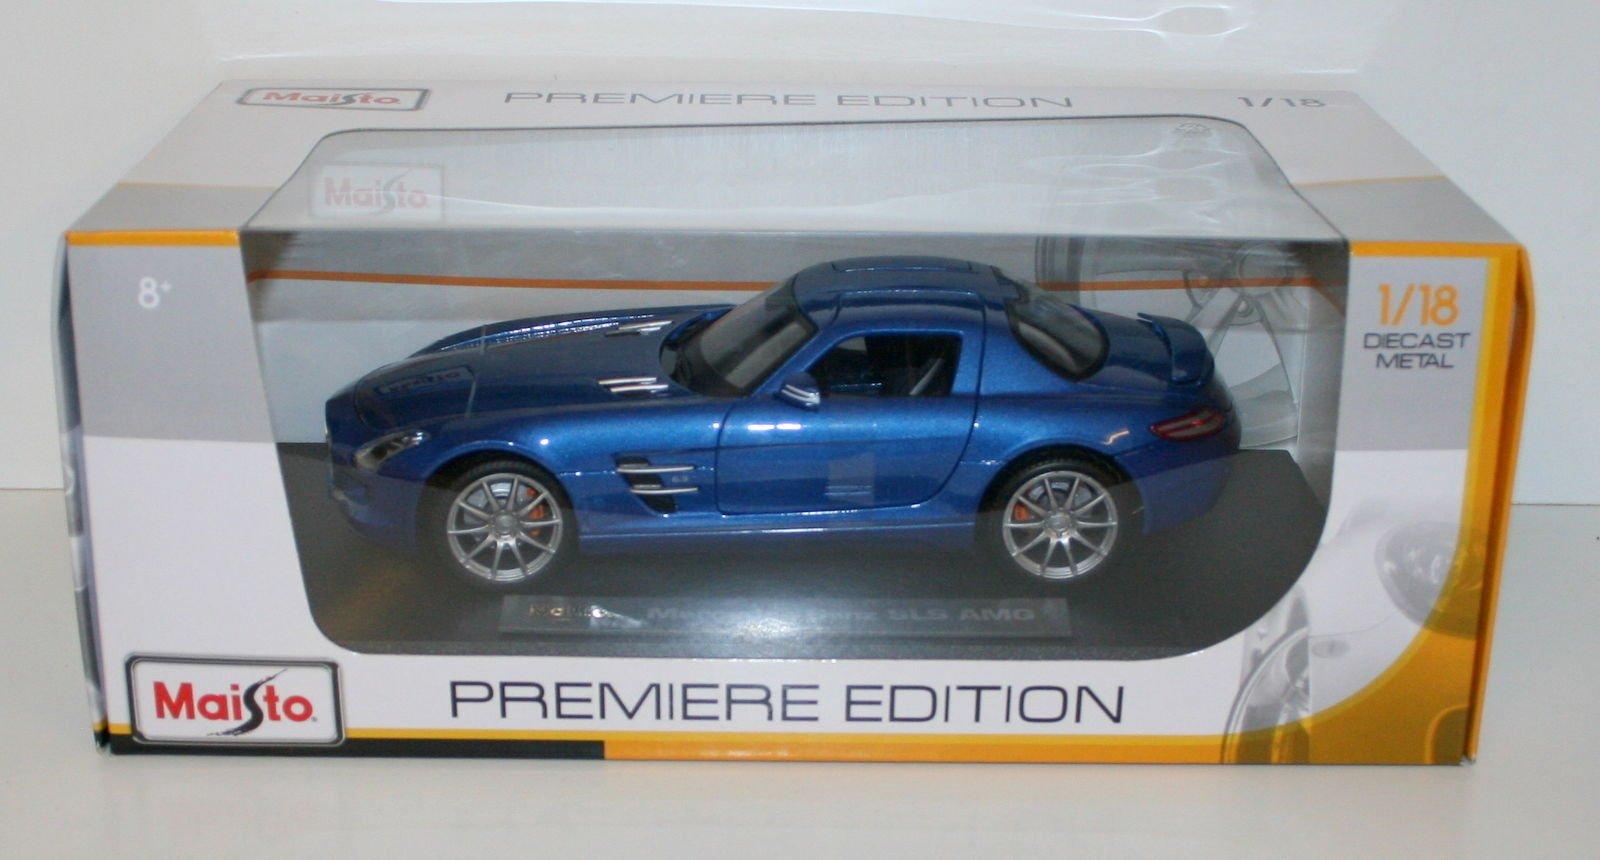 Mercedes-Benz SLS AMG Gullwing Blue 1:18 Scale Maisto Die Cast Model Car